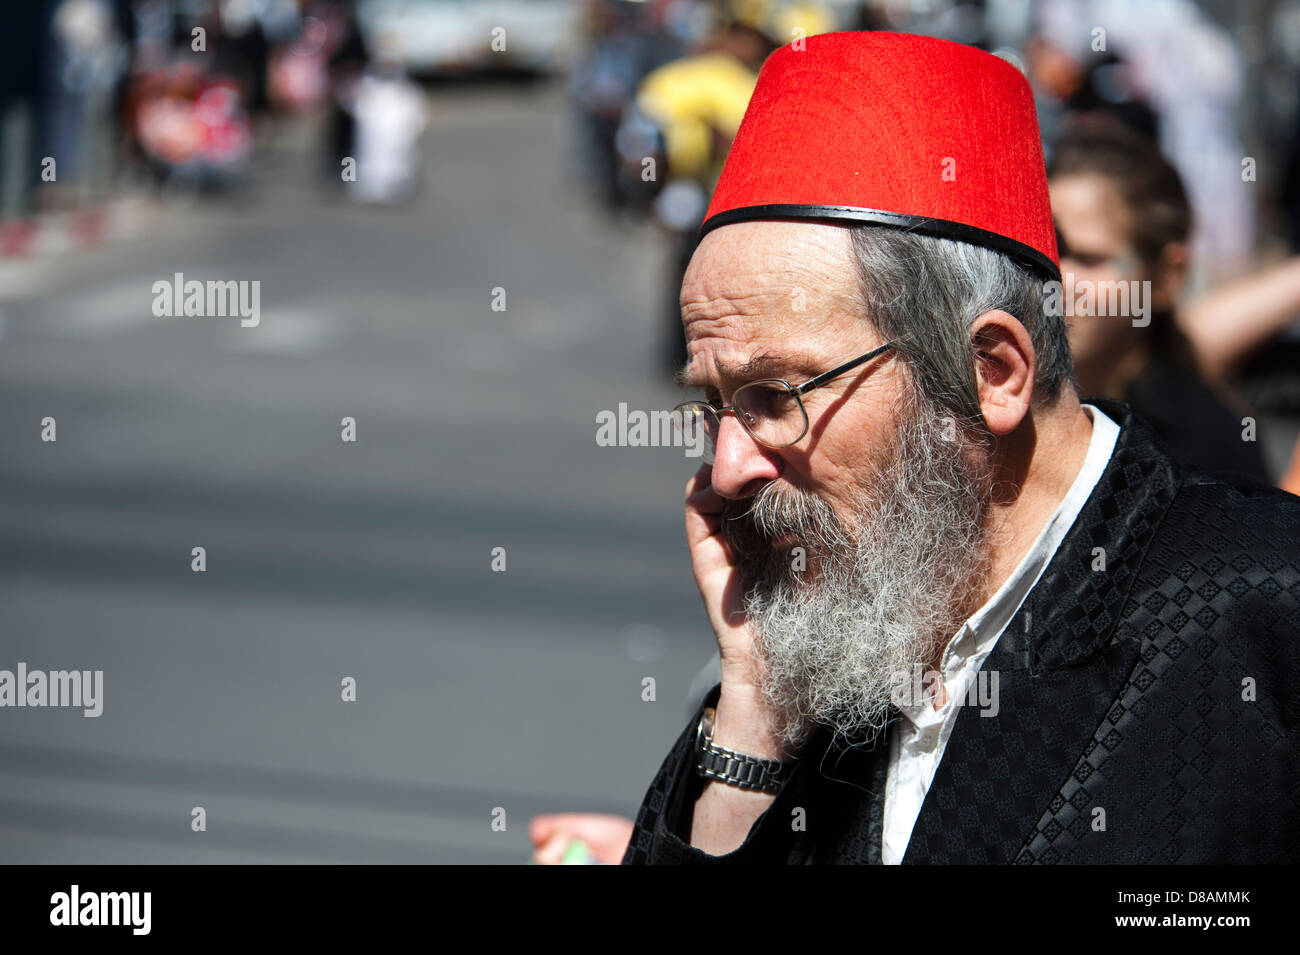 Orthodox man in Purim costume Photographed in Bnei Brak, Israel - Stock Image